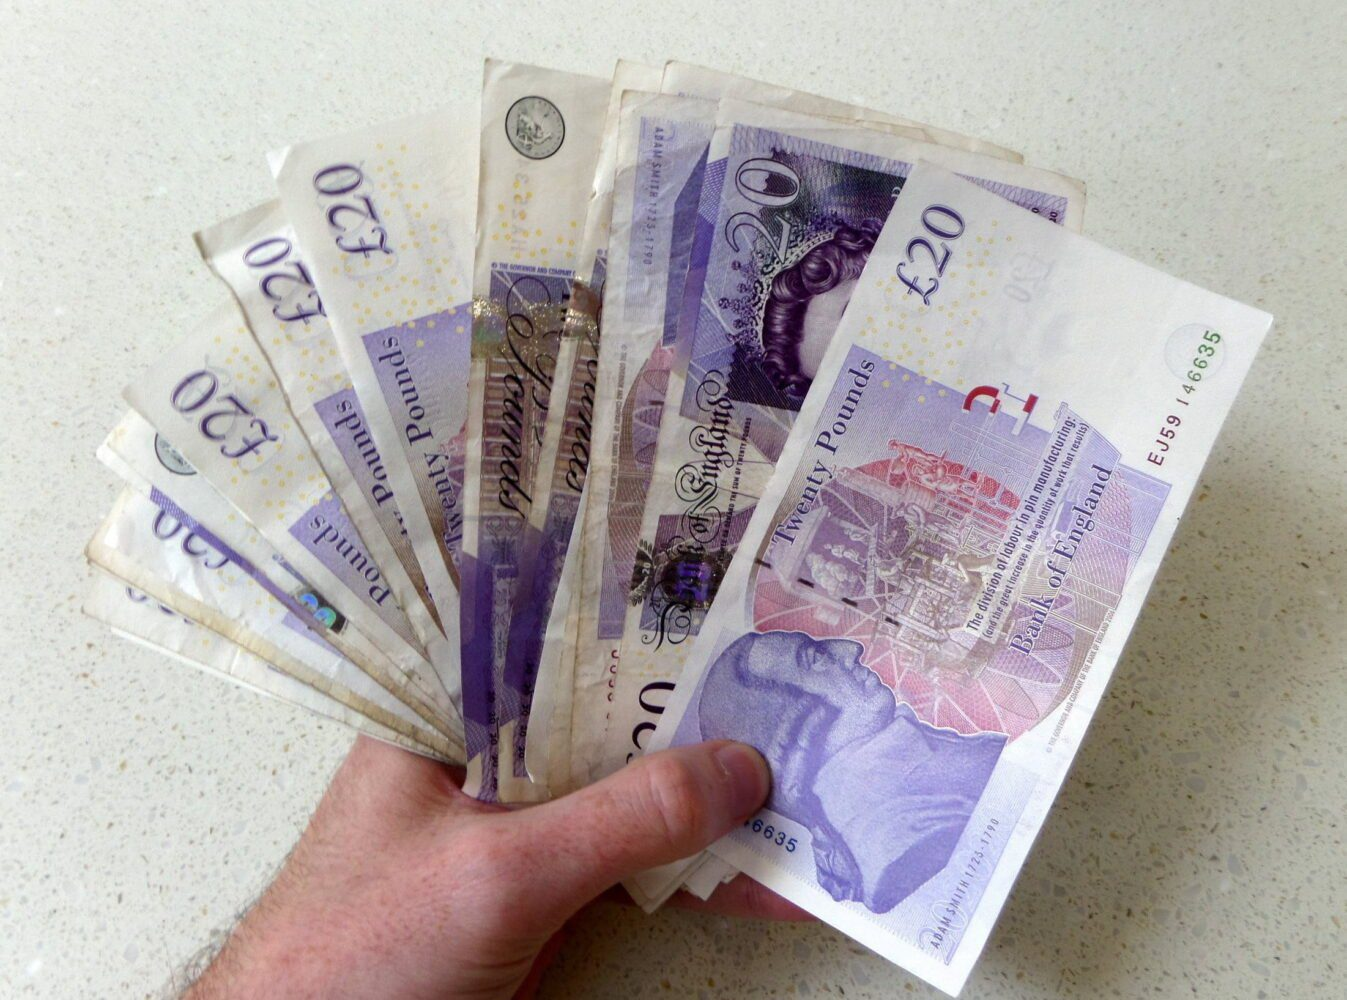 borrow 200 pounds online £200